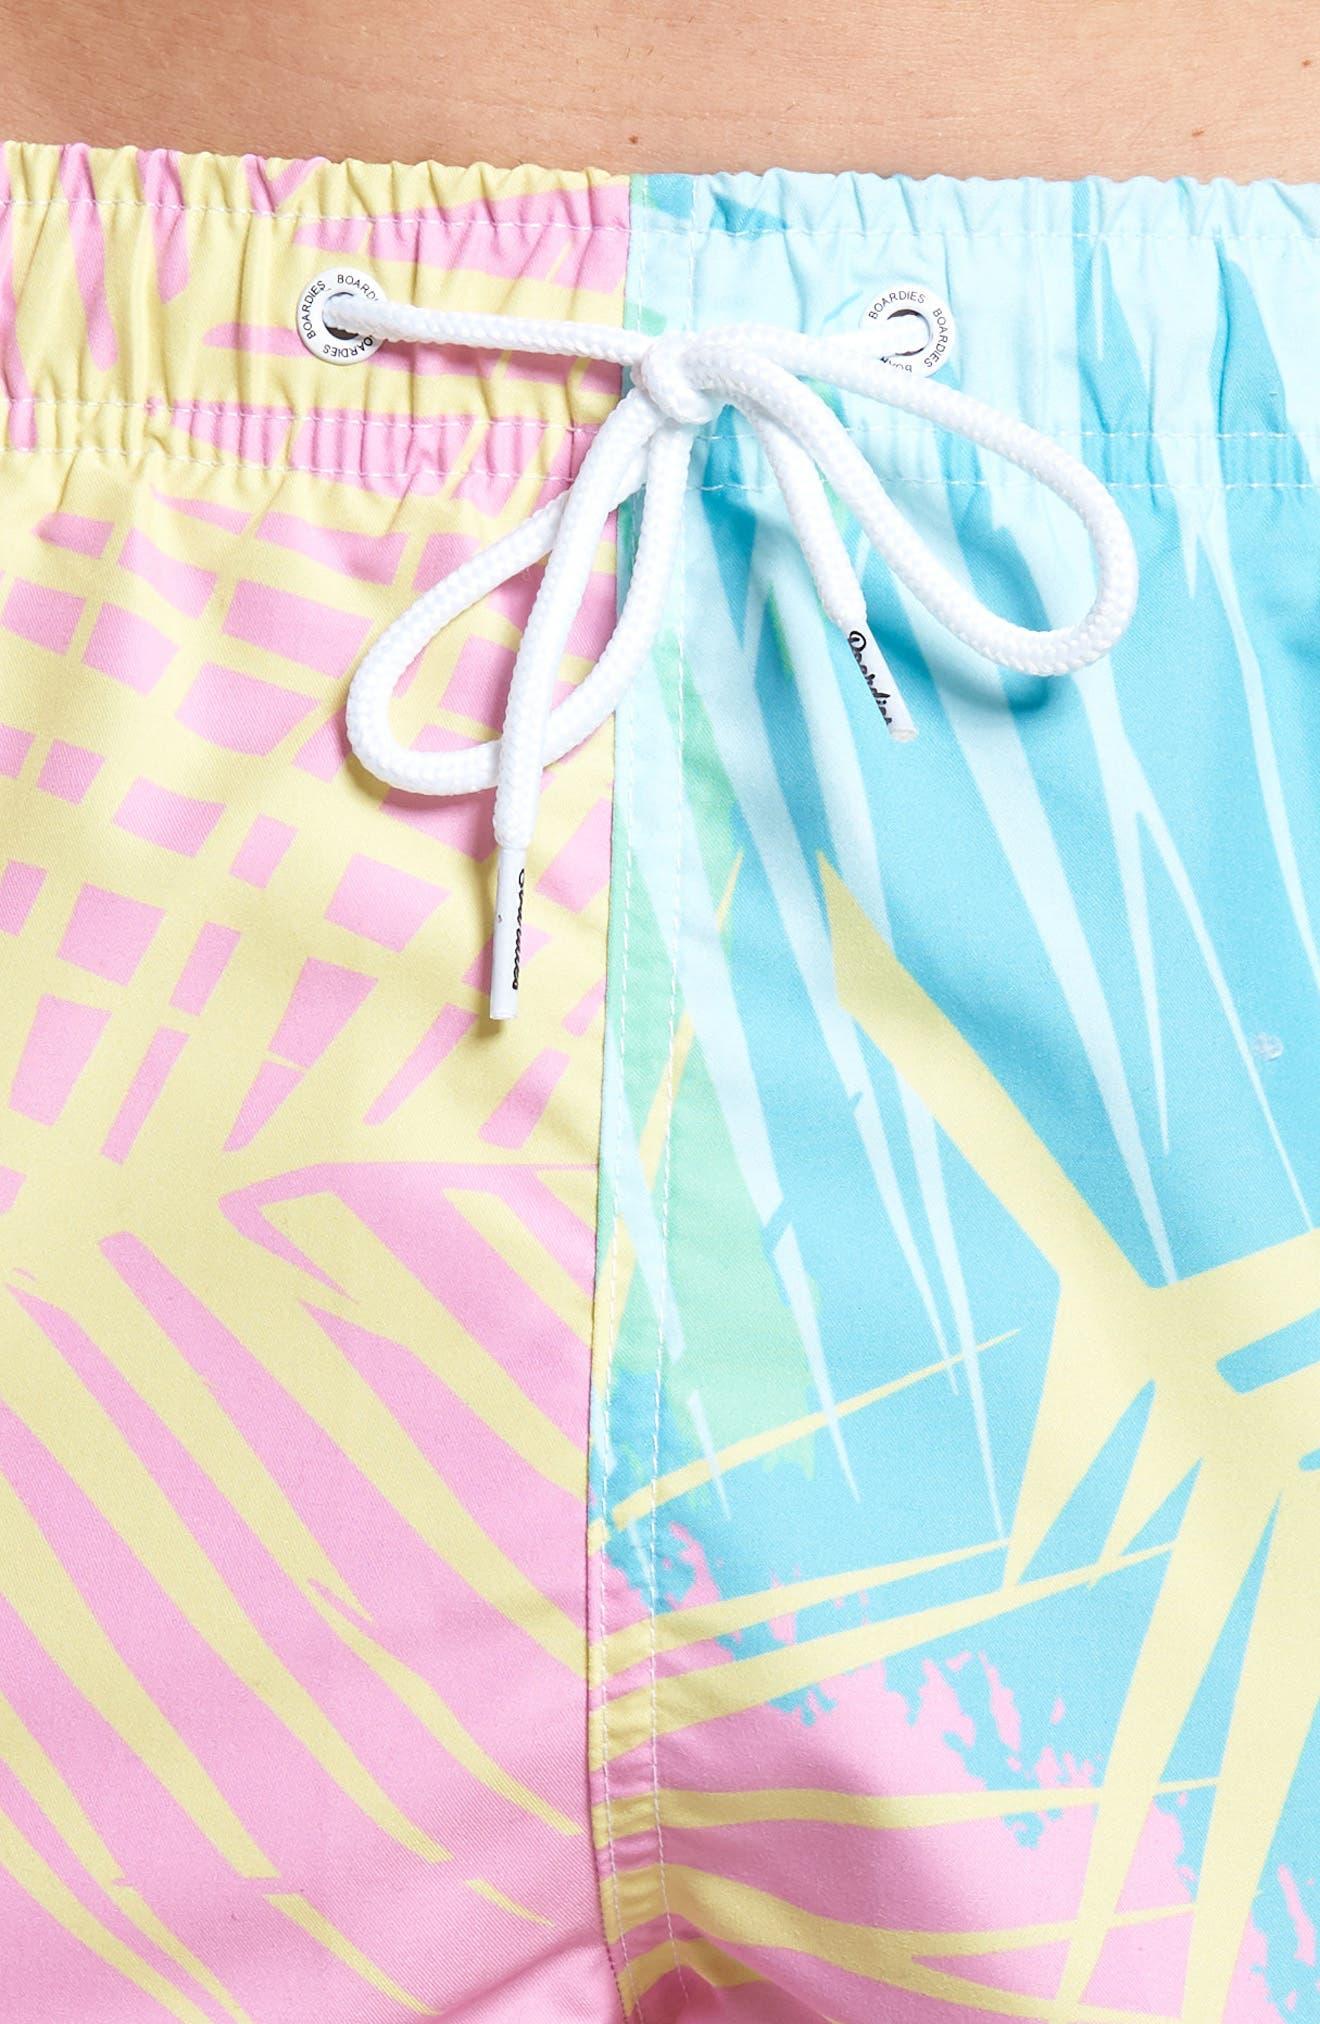 Tropicano Swim Trunks,                             Alternate thumbnail 4, color,                             Multi